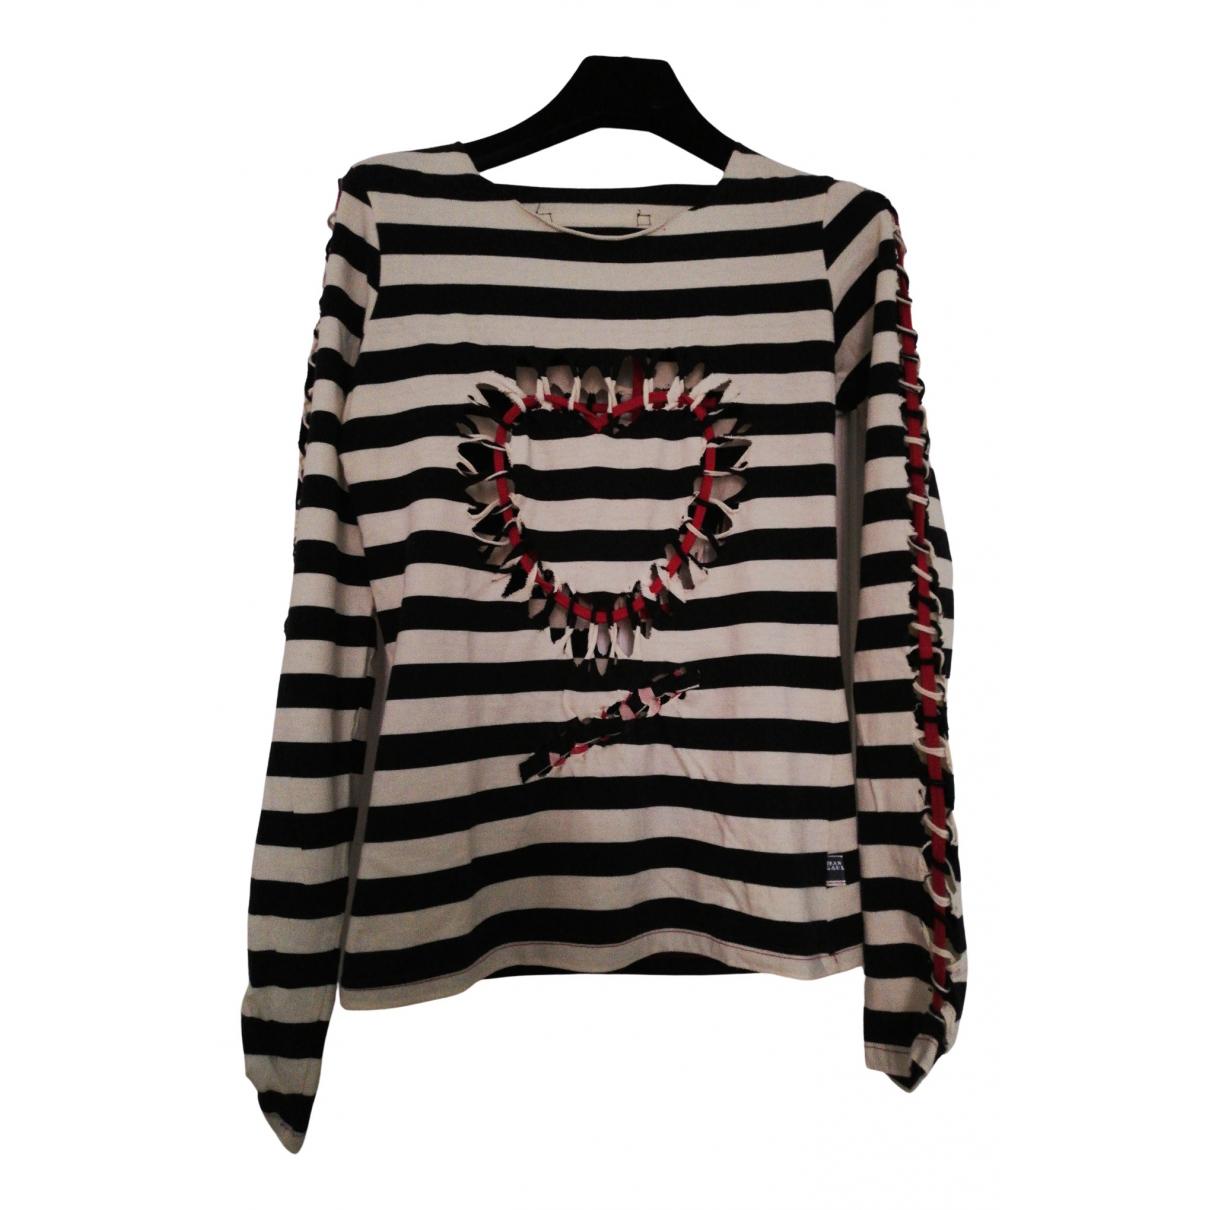 Jean Paul Gaultier N Multicolour Cotton  top for Women S International